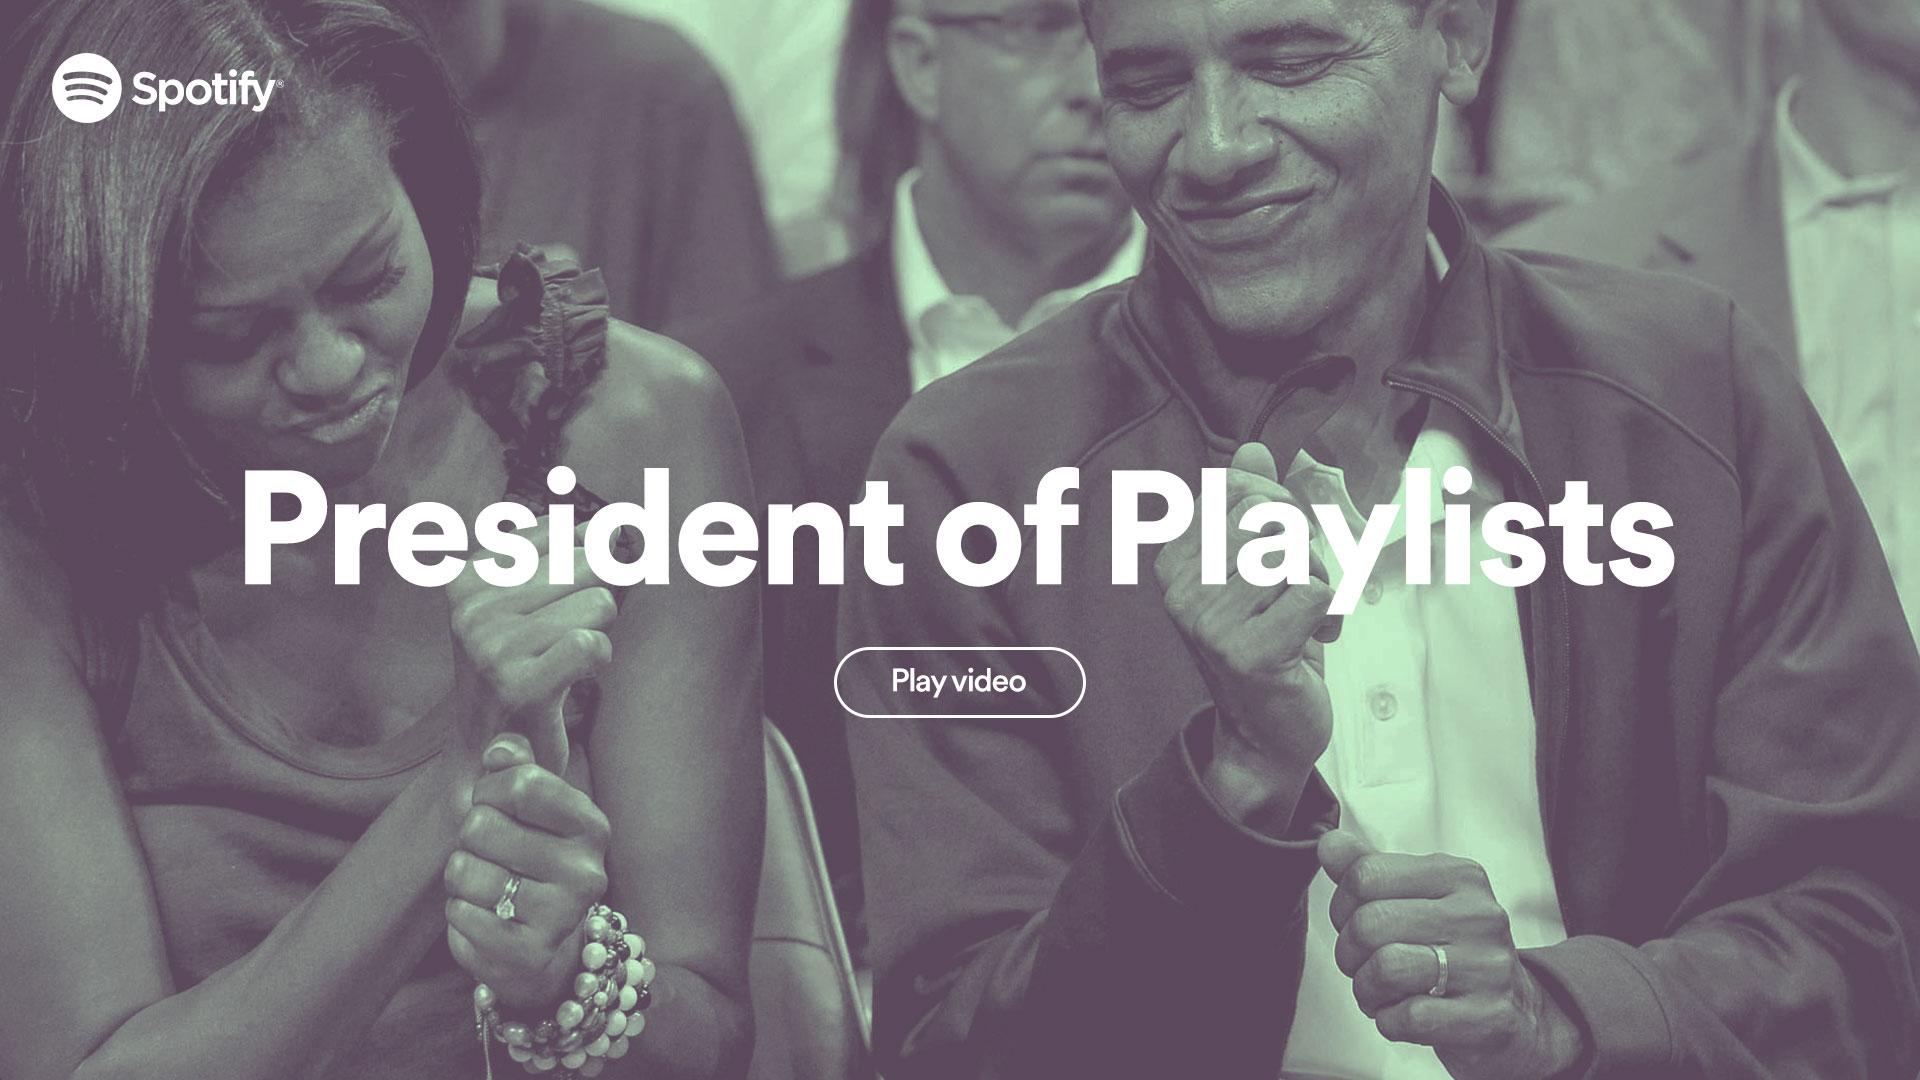 Webby Award Nominee - President of Playlists